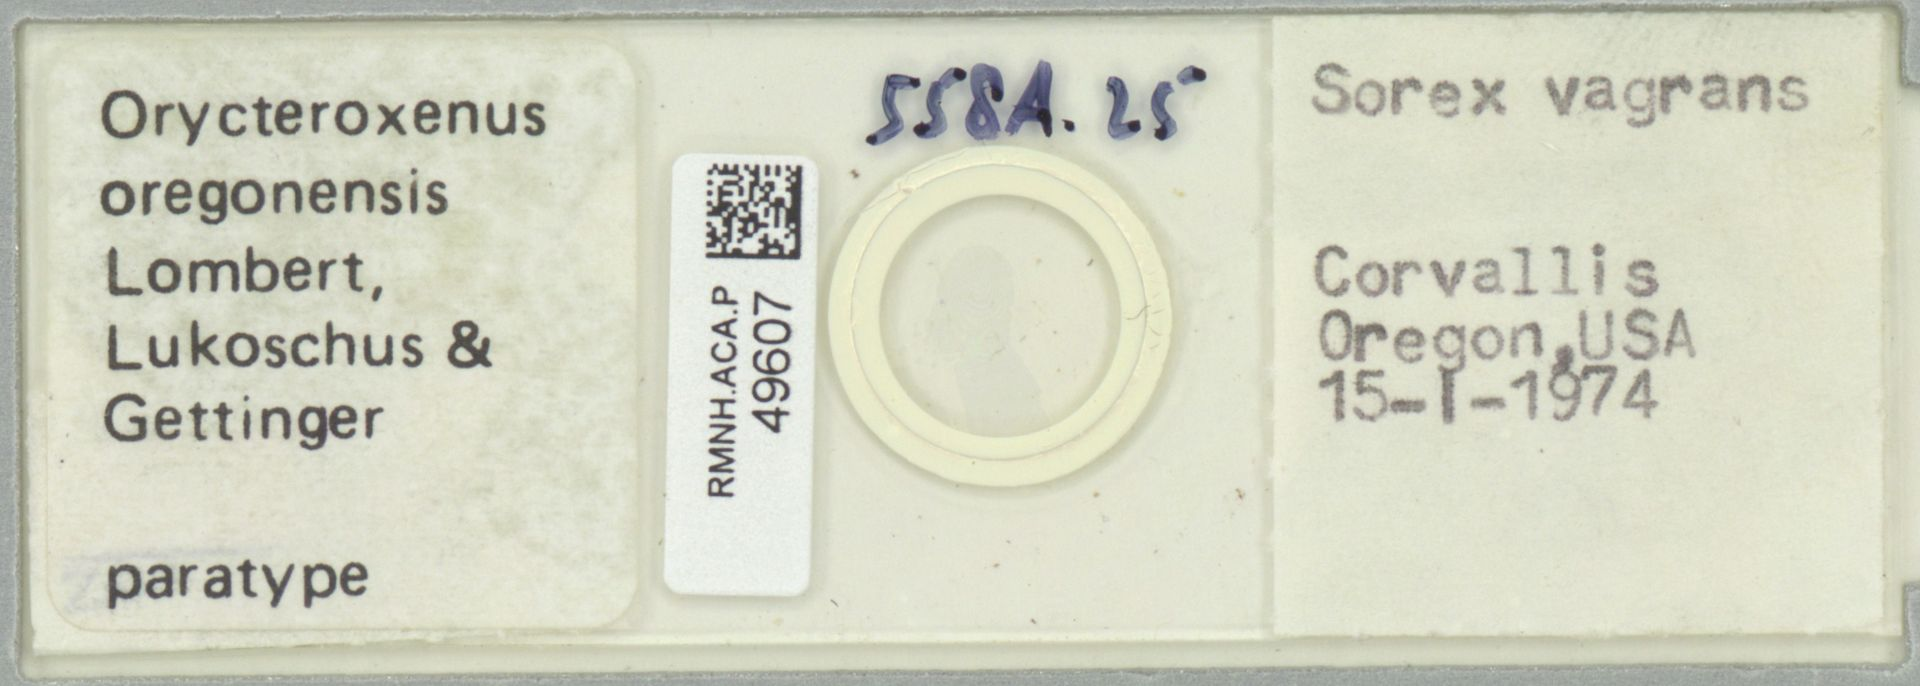 RMNH.ACA.P.49607 | Orycteroxenus oregonensis Lombert, Lukoschus & Gettinger